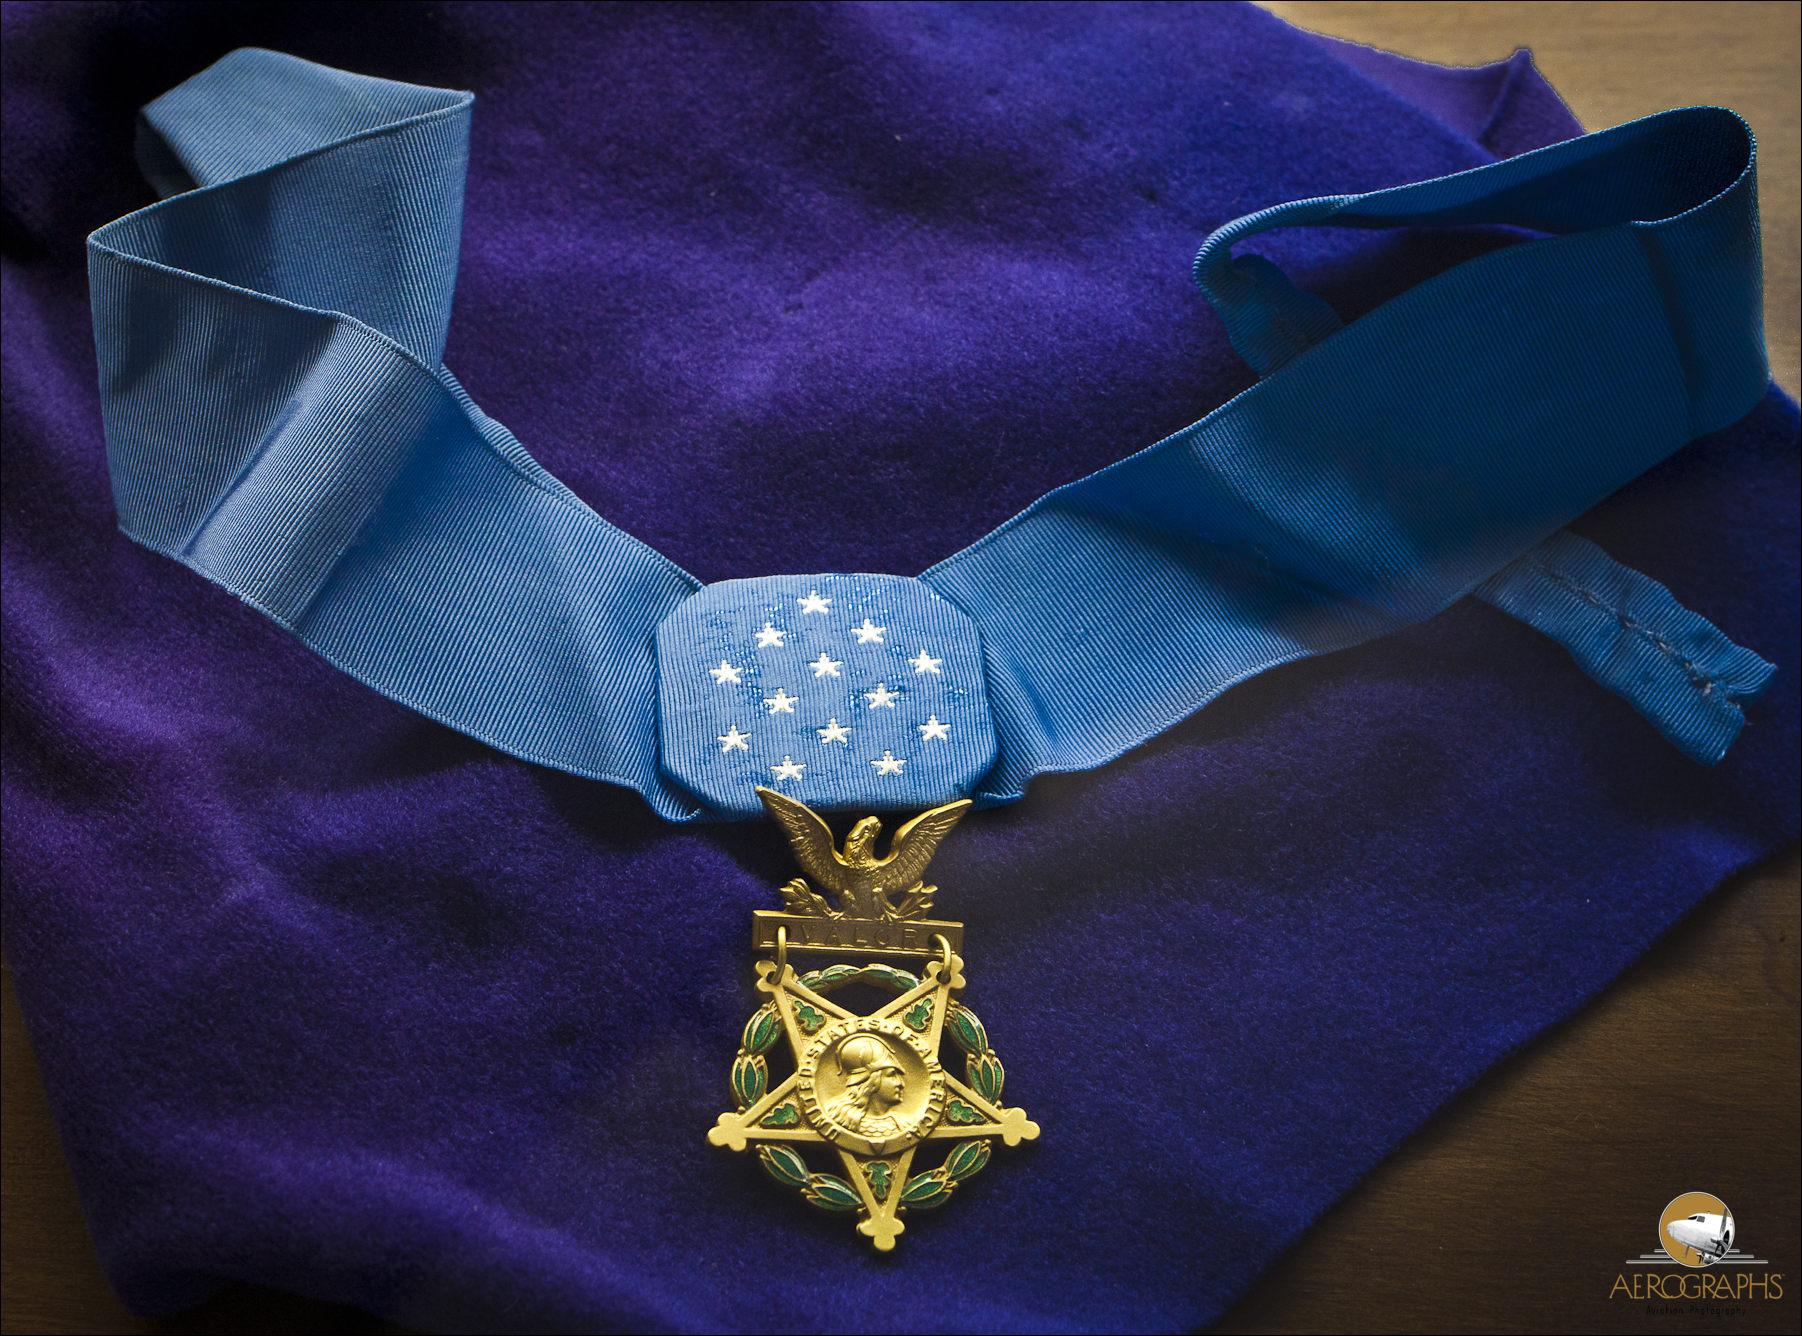 Charles Lindbergh's Medal of Honor, bestowed upon him by President Calvin Coolidgeafter his historic trans-Atlantic flight.